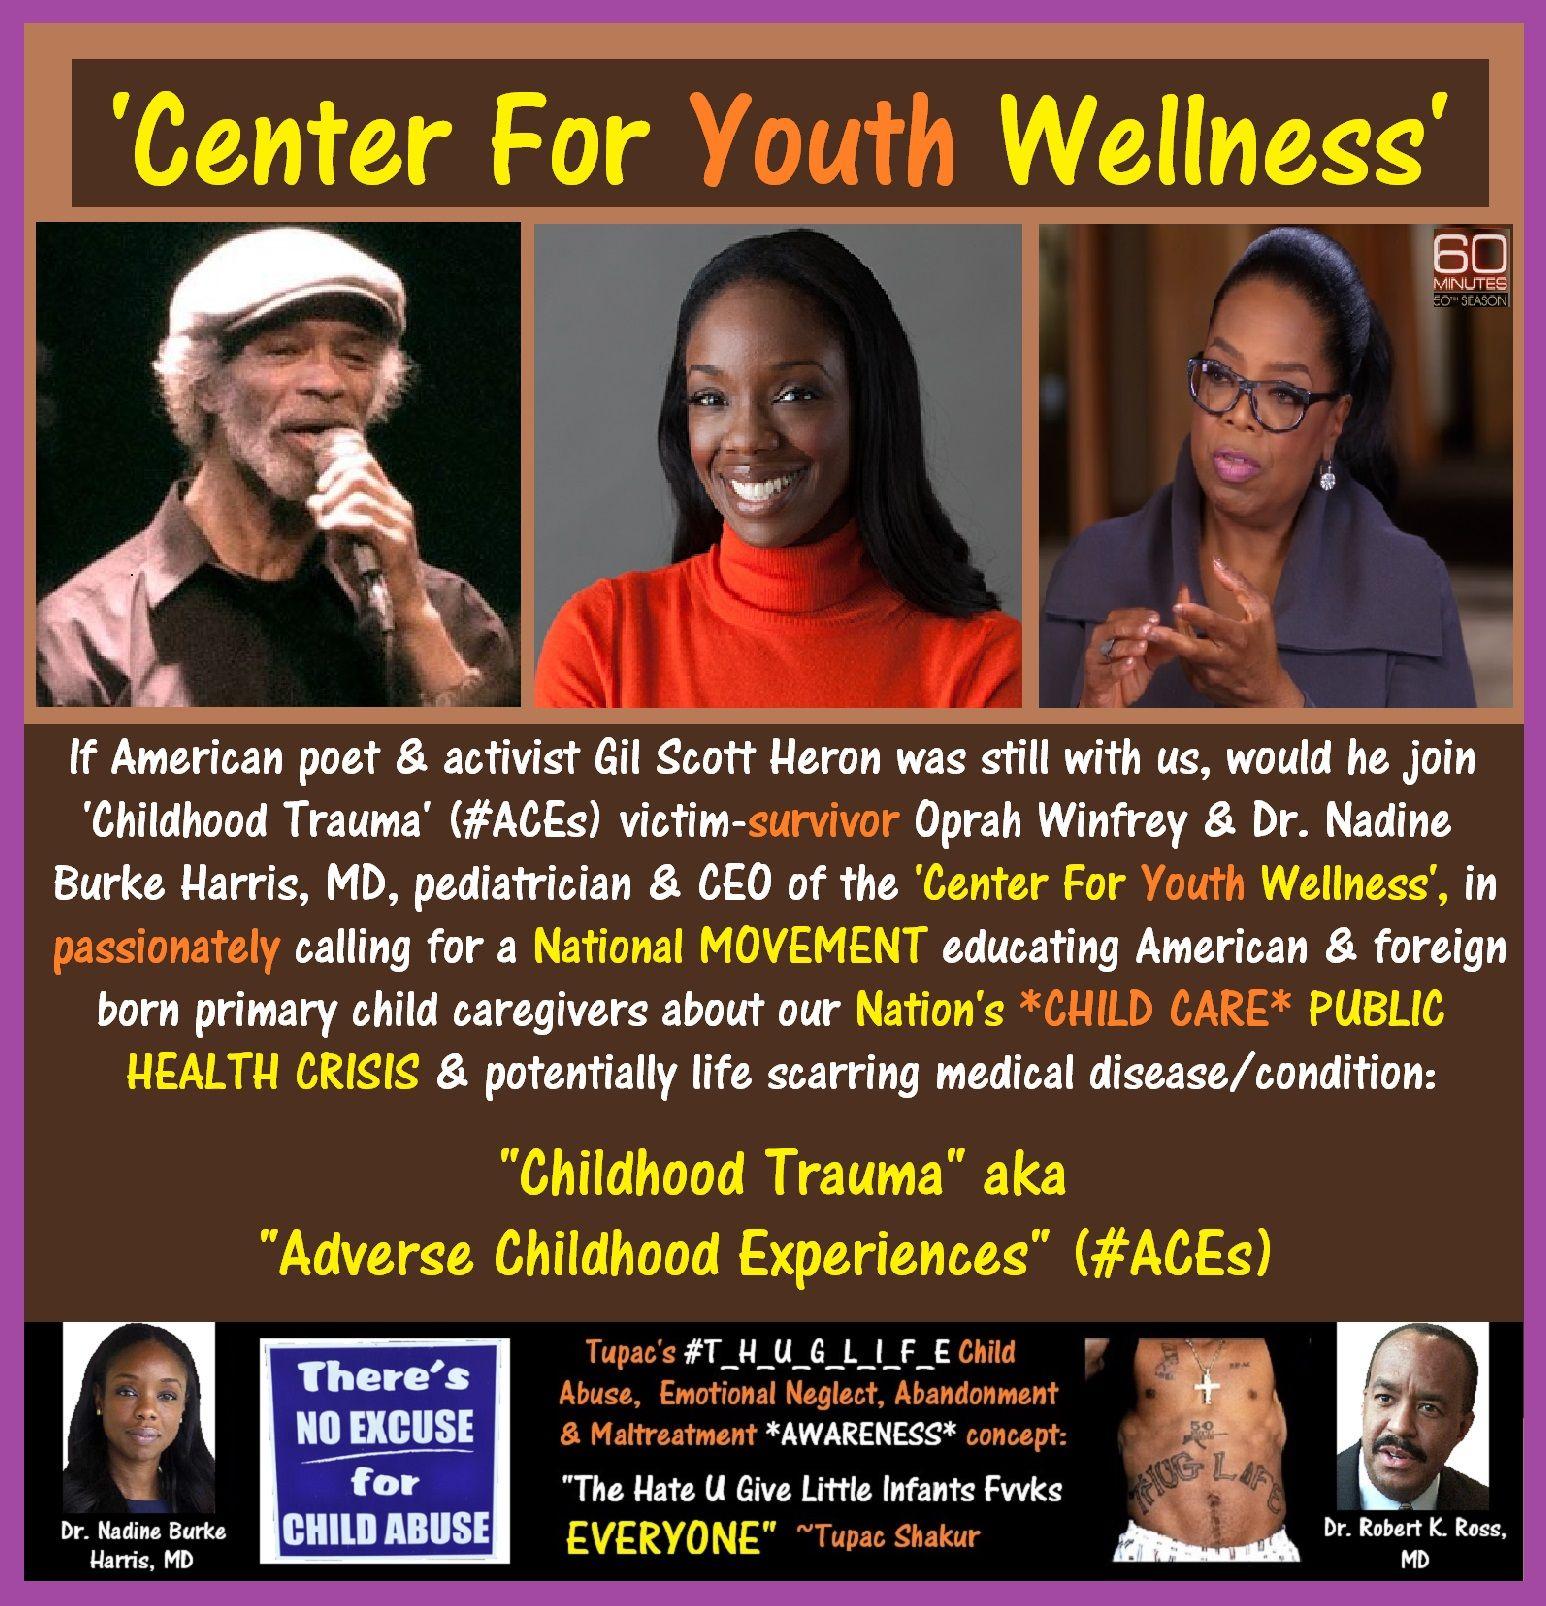 Gil Scott Heron, Oprah Winfrey, Dr. Nadine Burke Harris.jpg